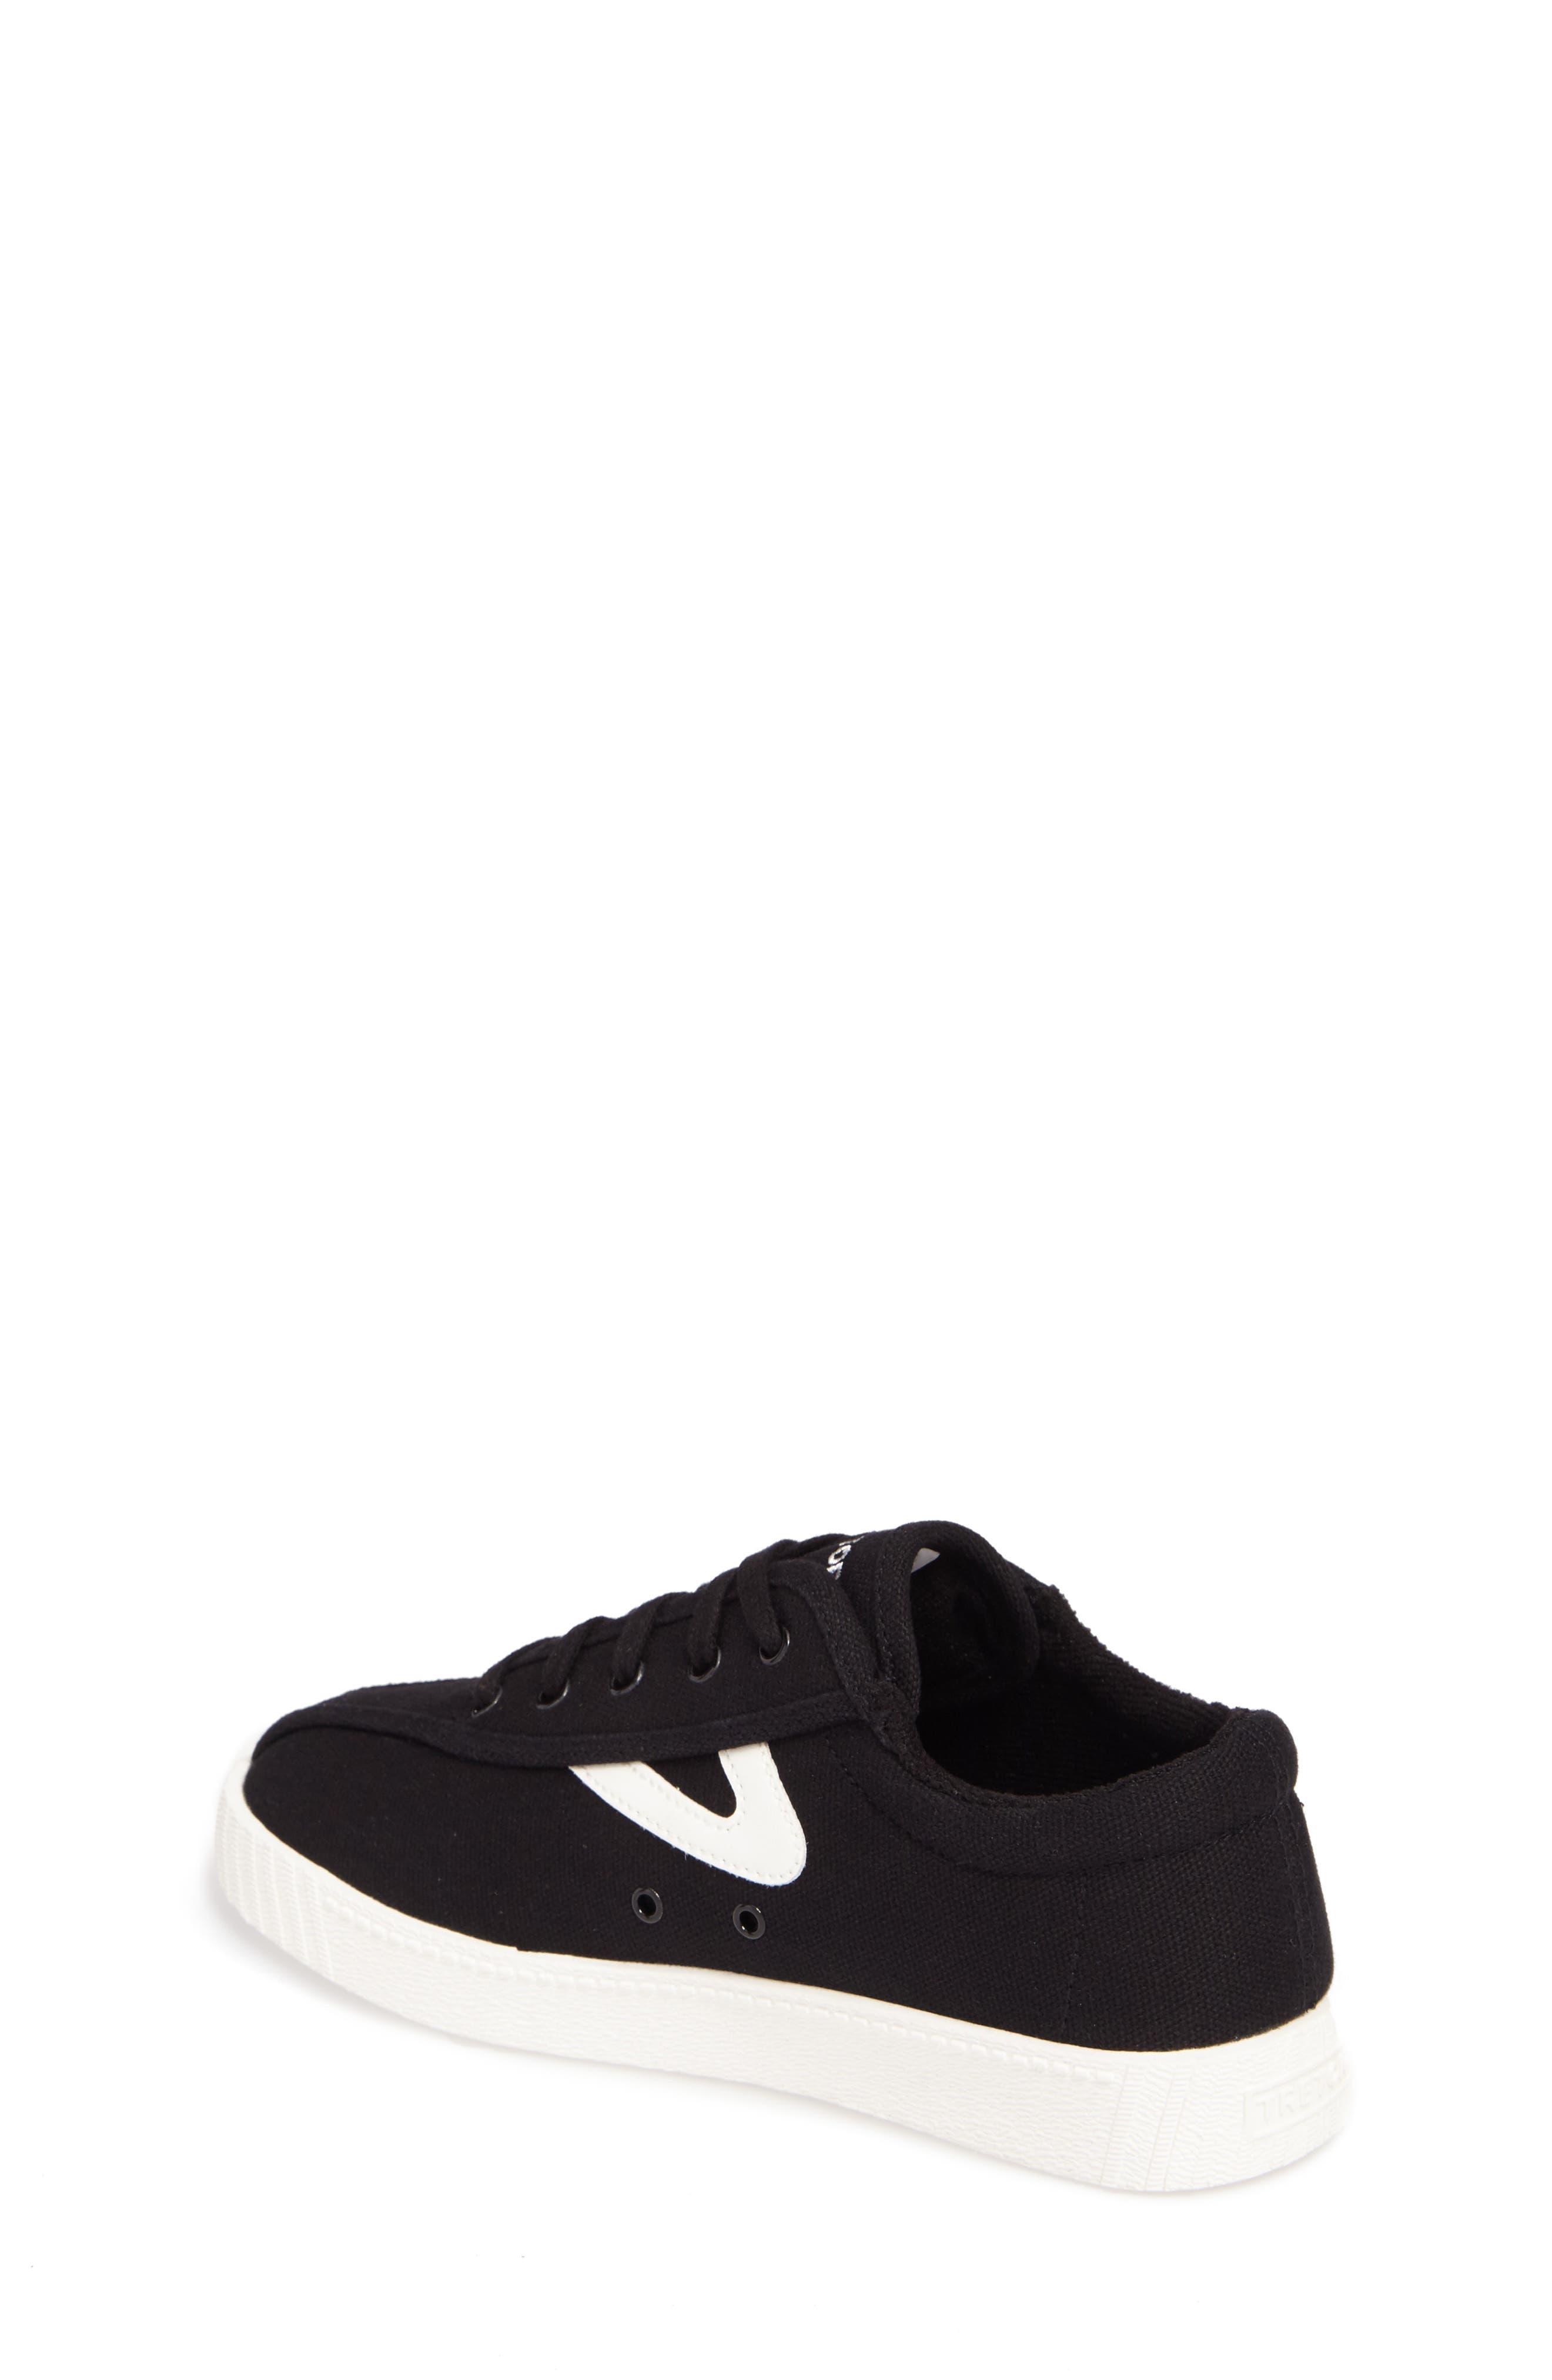 TRETORN, Nylite Plus Sneaker, Alternate thumbnail 2, color, 012